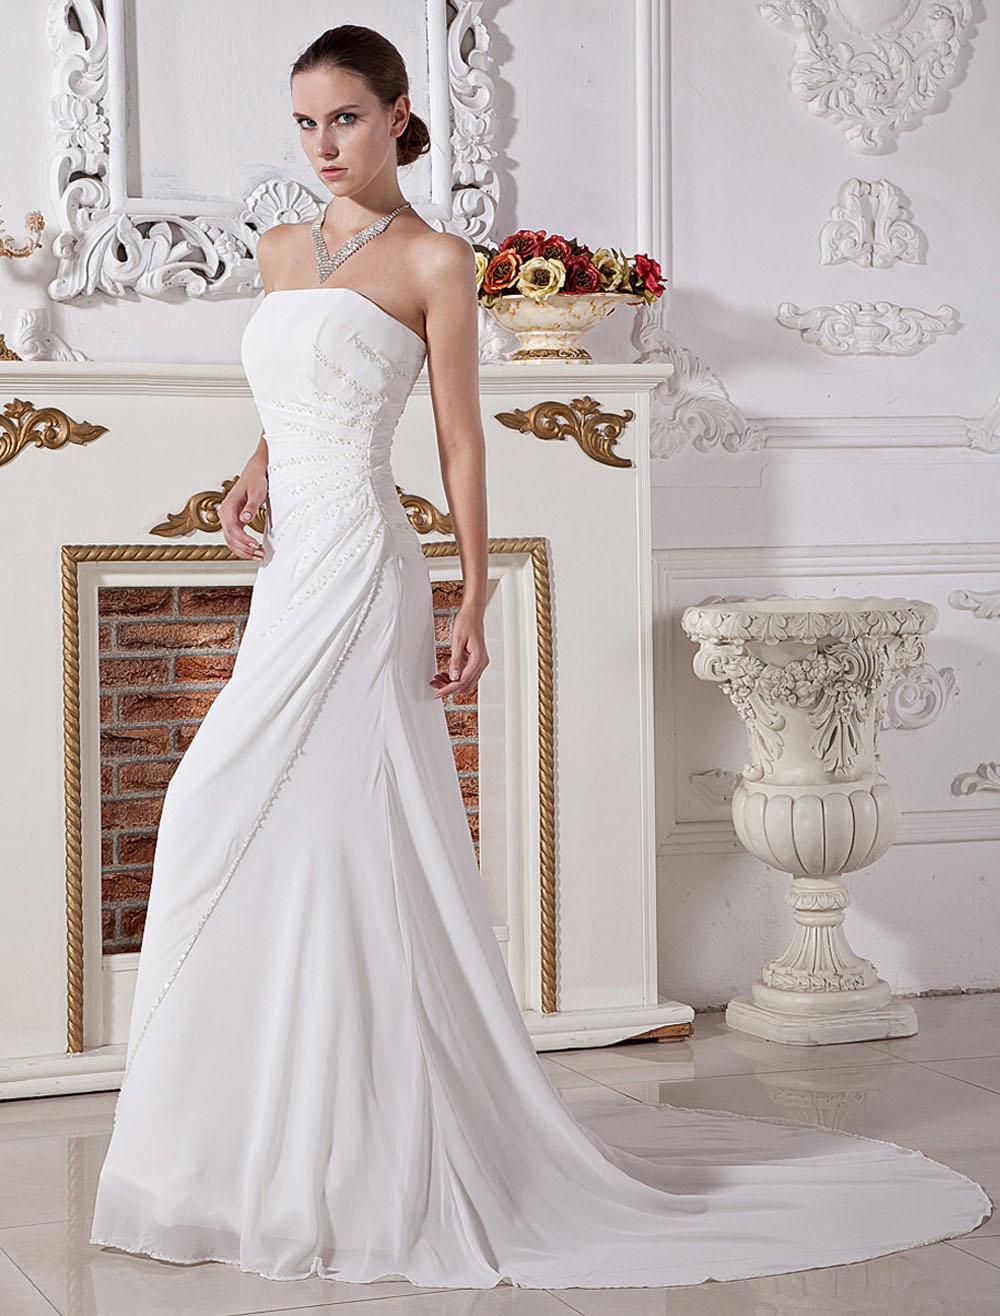 White Wedding Gown Strapless Ruched Sash Chiffon Wedding Dress (Cheap Wedding Dress) photo